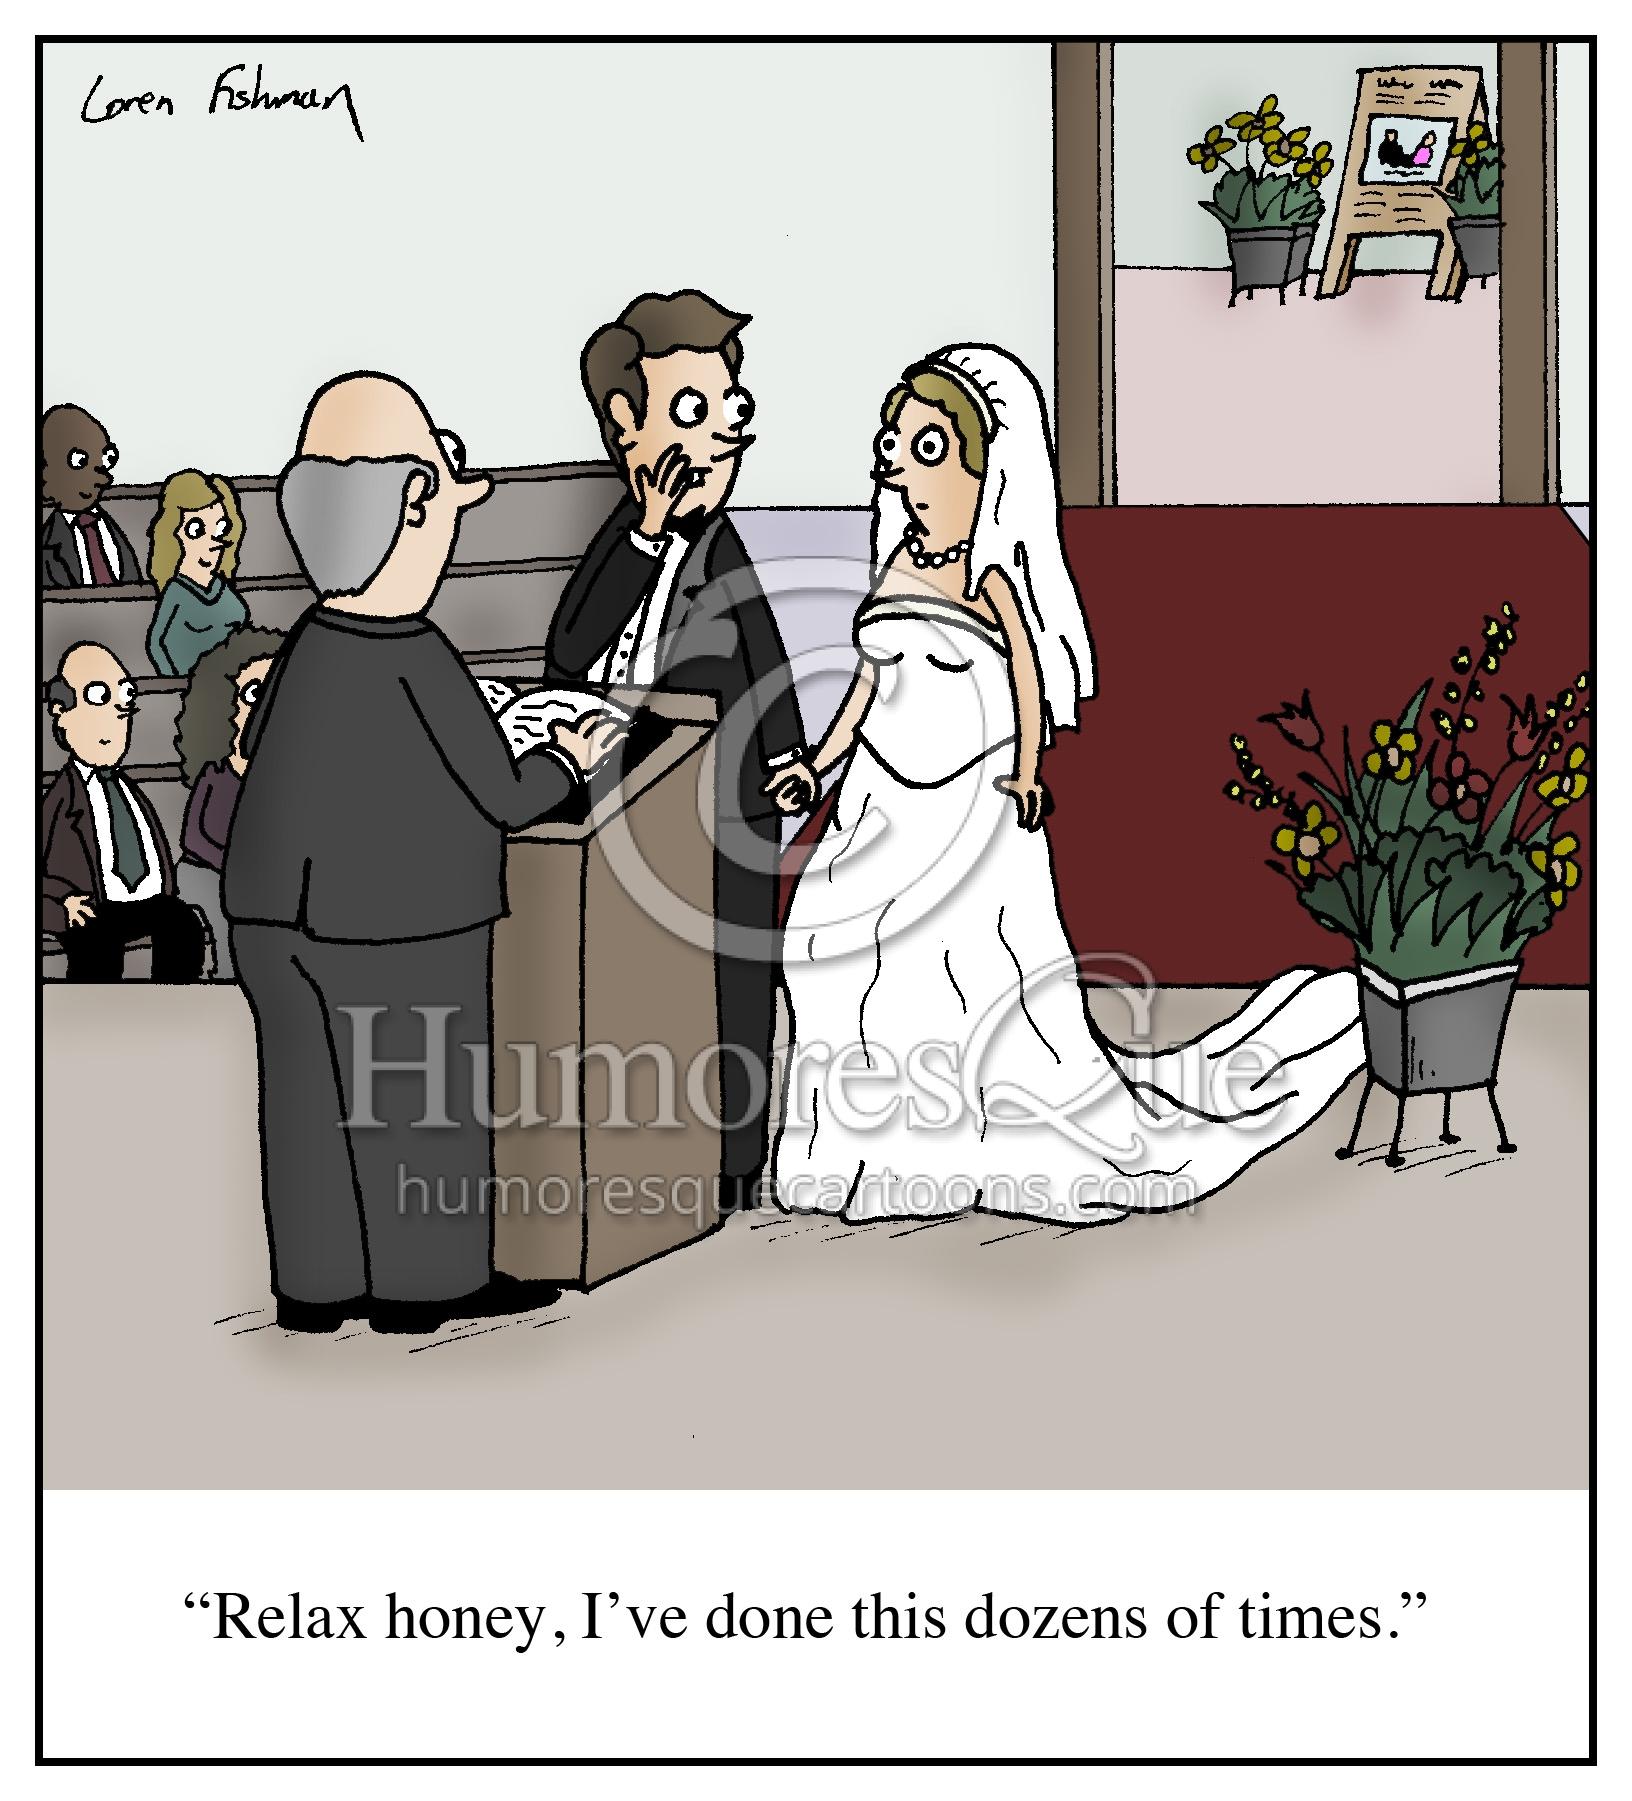 wedding groom says he's done it dozens of times marriage cartoon